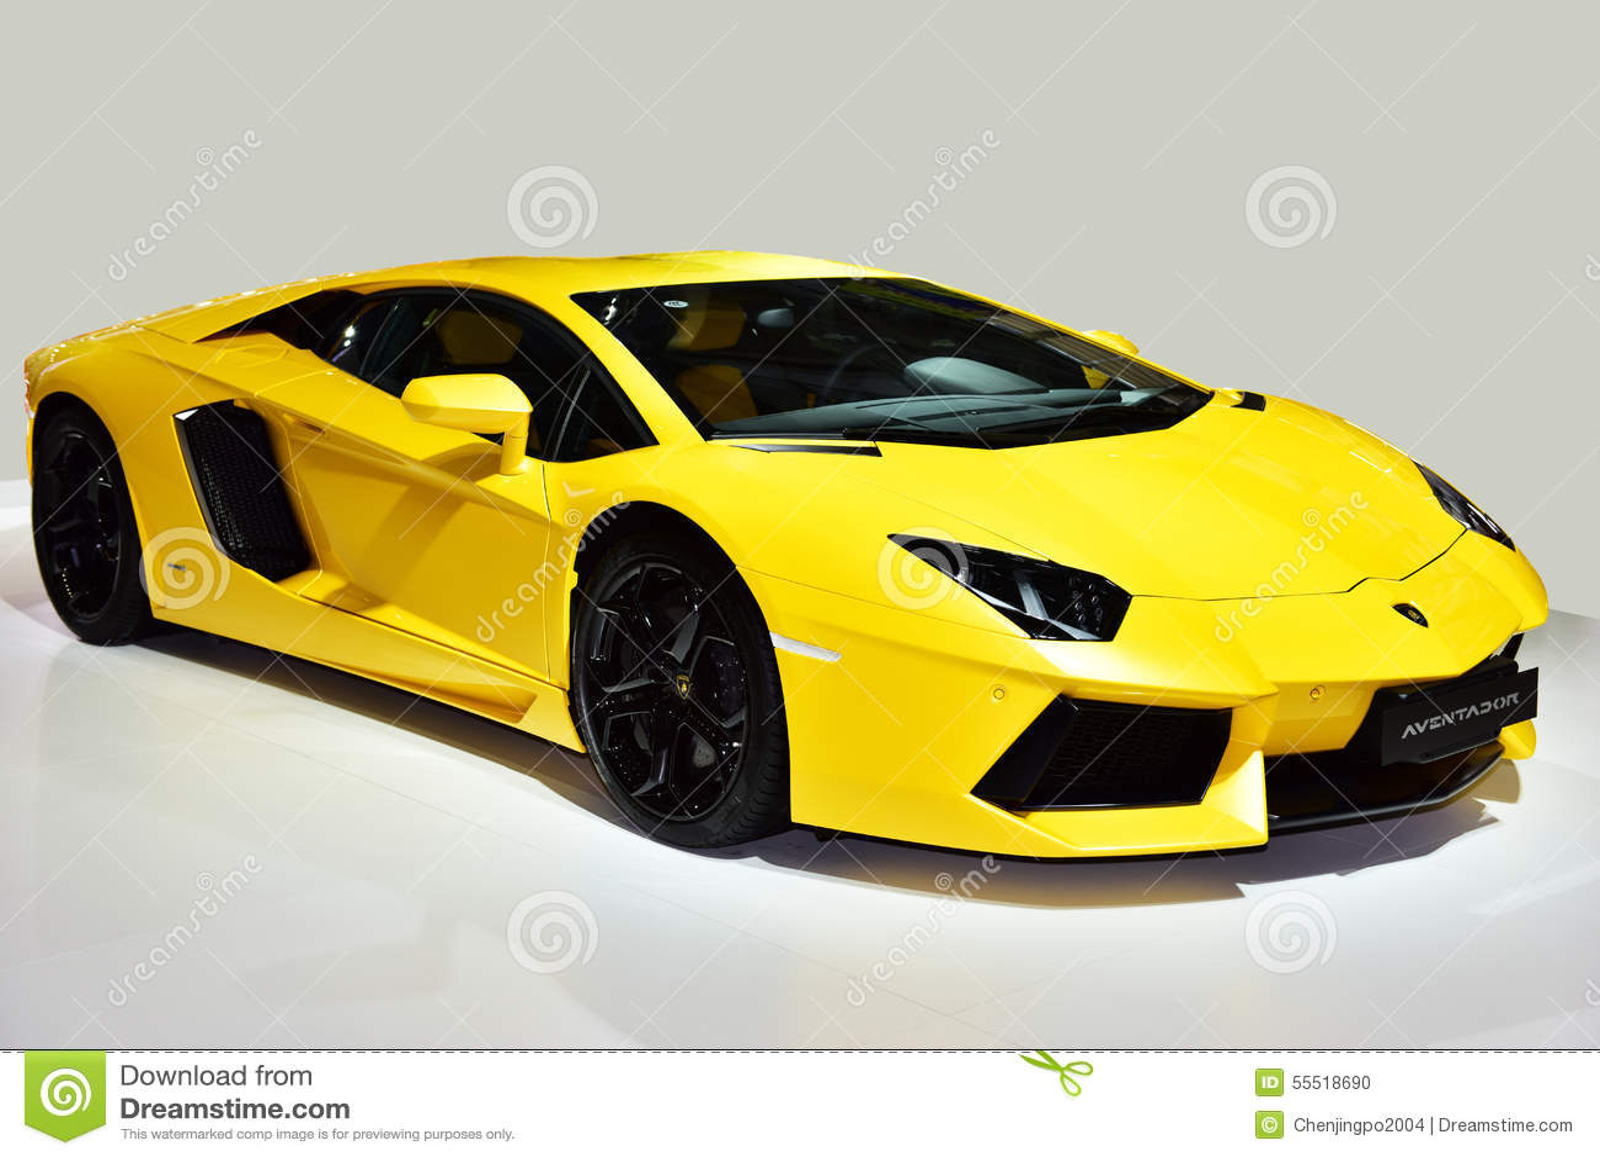 Lamborghini Aventador汽车